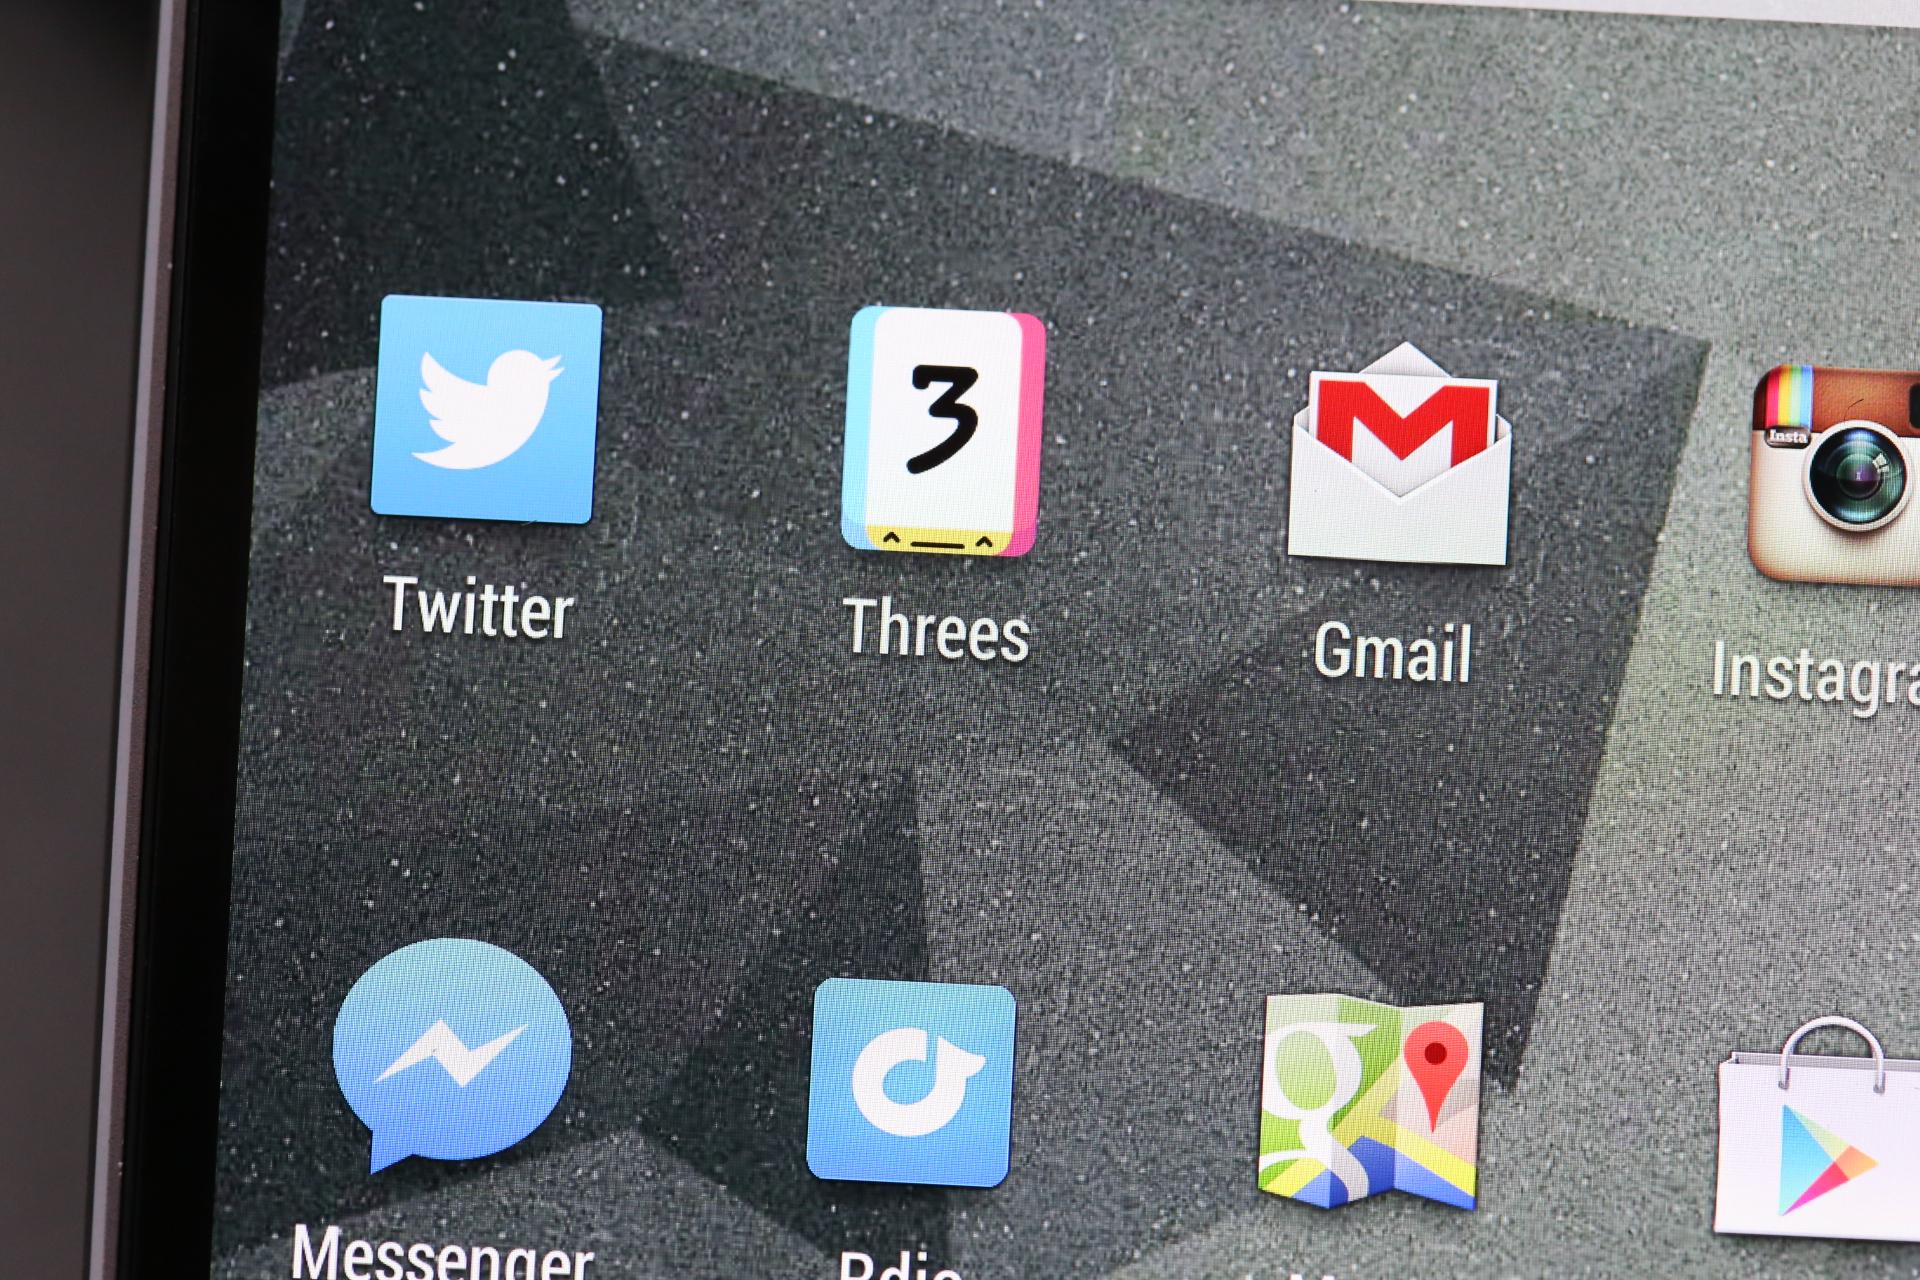 HTC-One-M8-Display